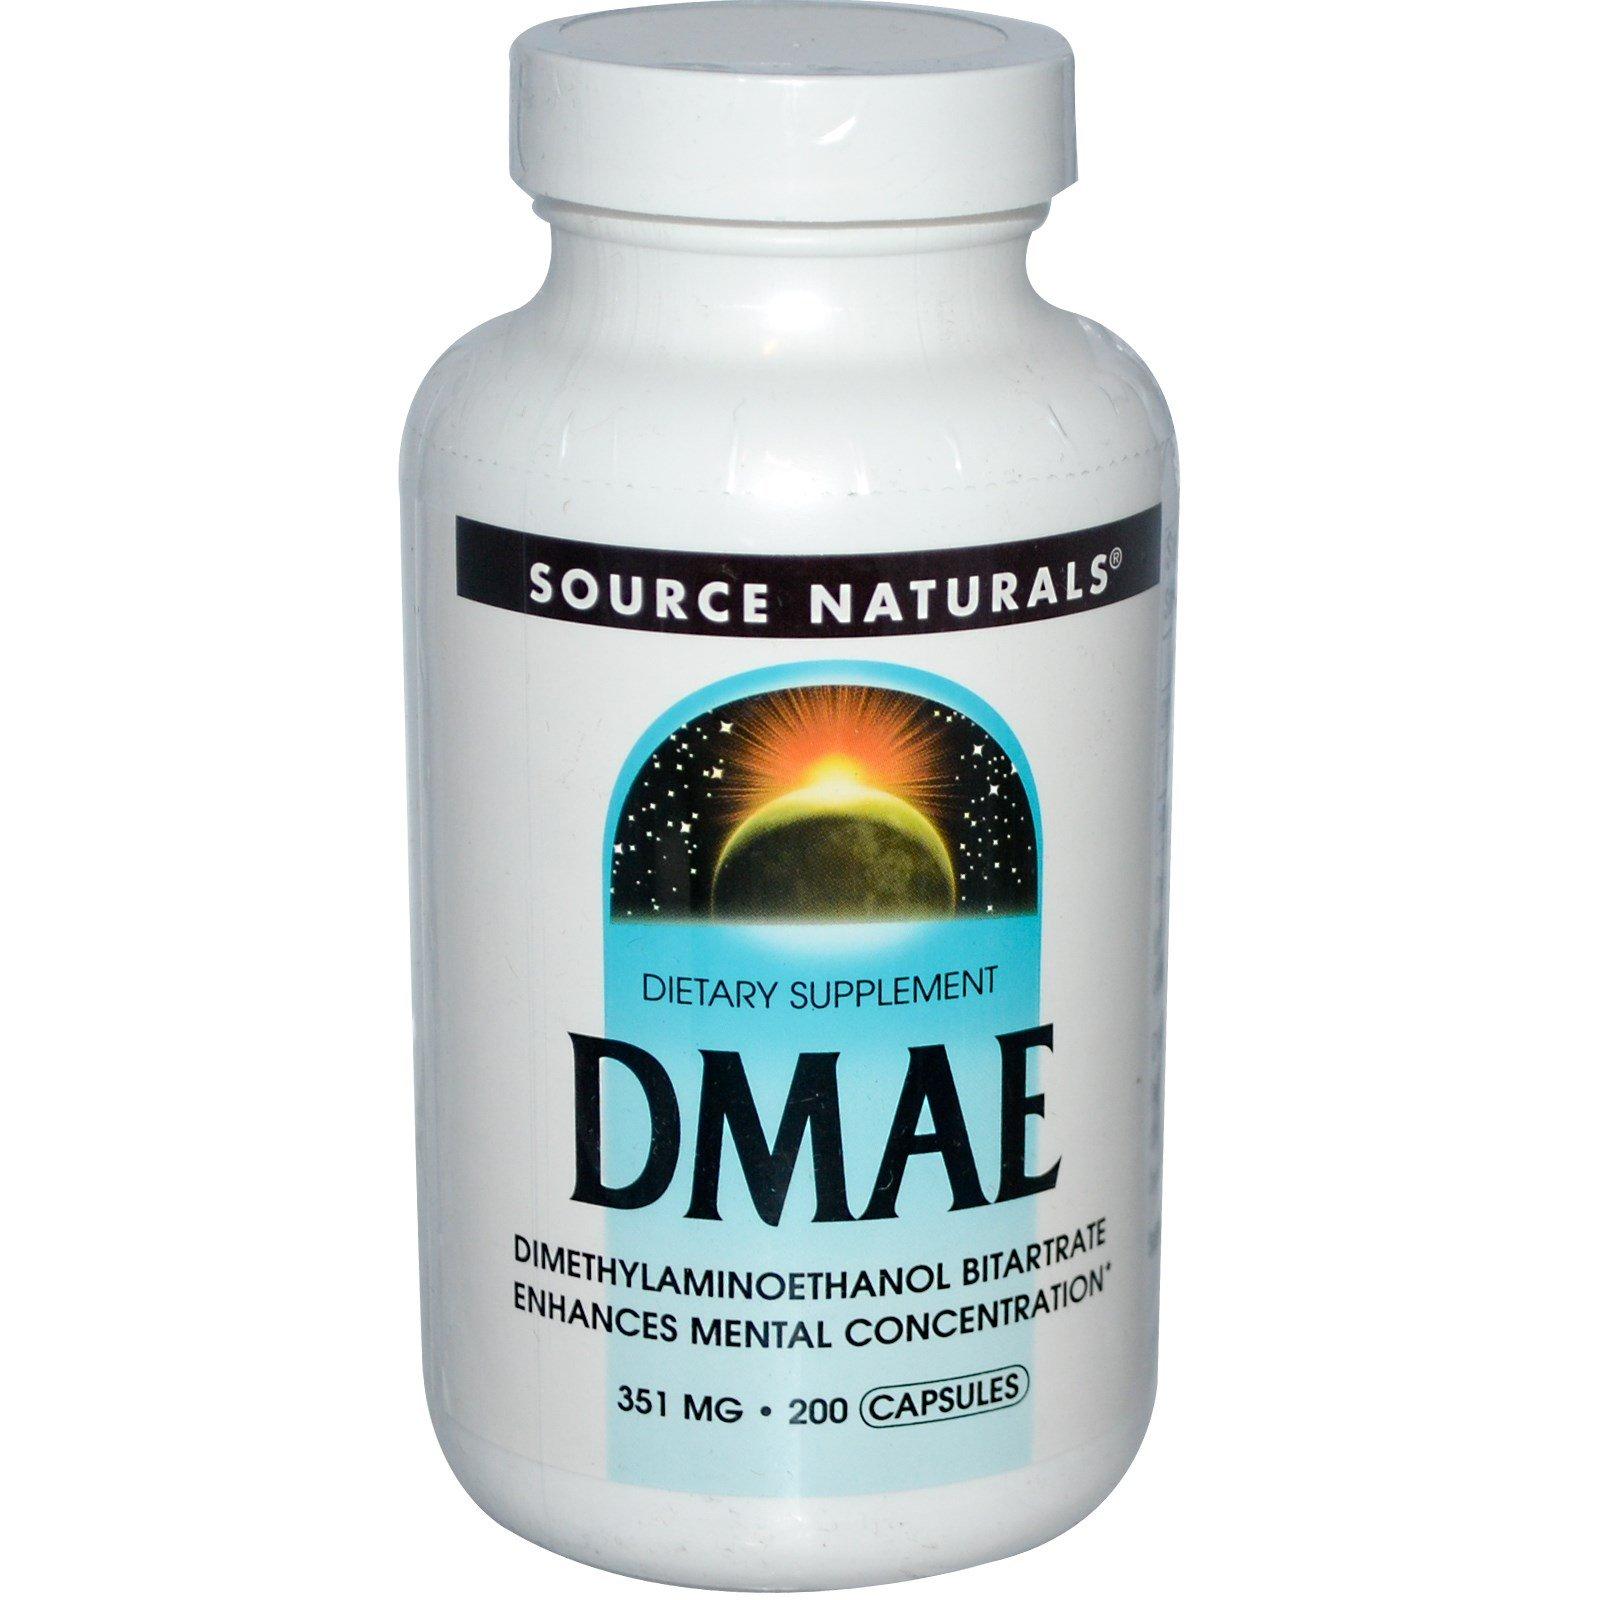 Source Naturals, DMAE, 351 mg, 200 Capsules - 3PC